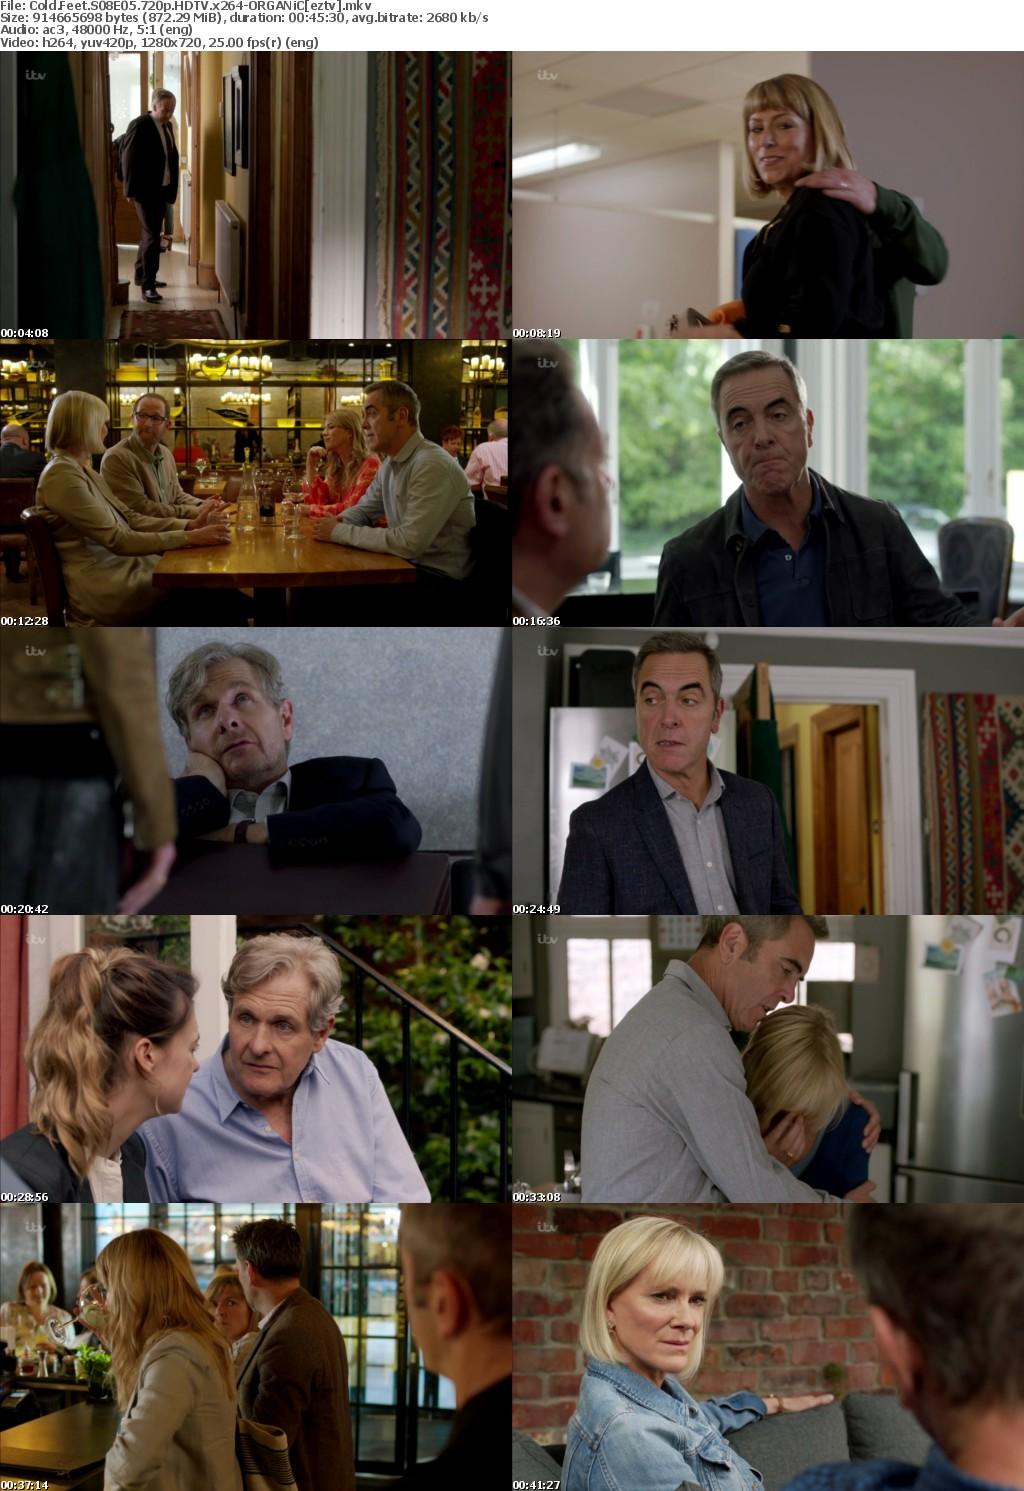 Cold Feet S08E05 720p HDTV x264-ORGANiC